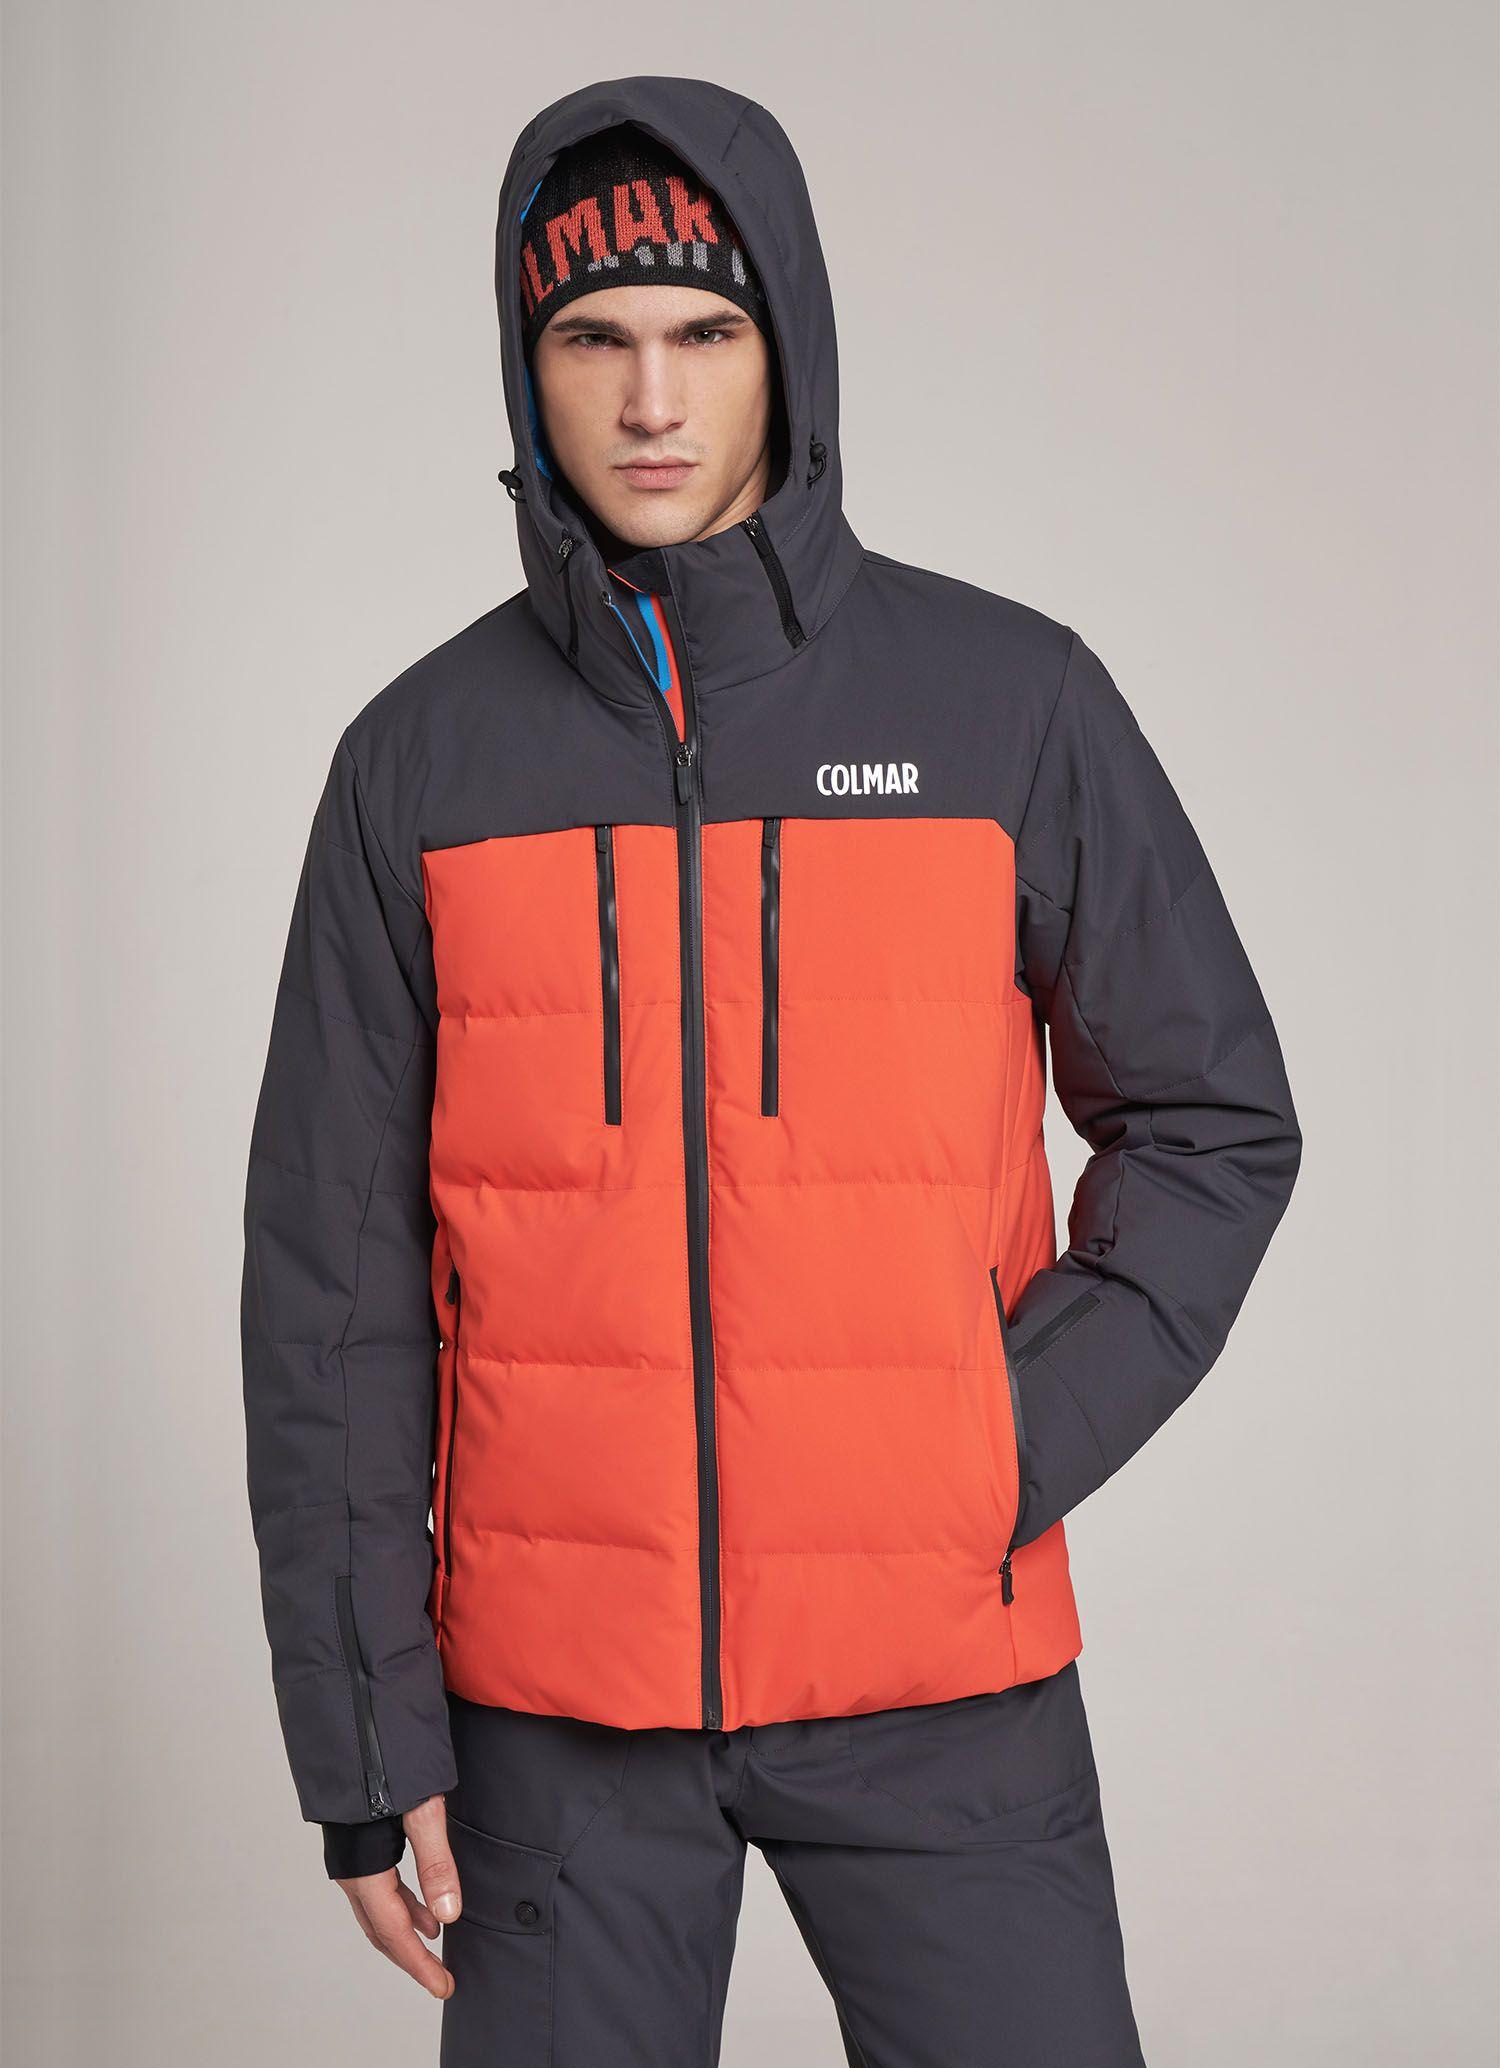 Chamonix Jacket 000 Ski Mm Colmar Resistance With Men's Water 15 CdRwxSq